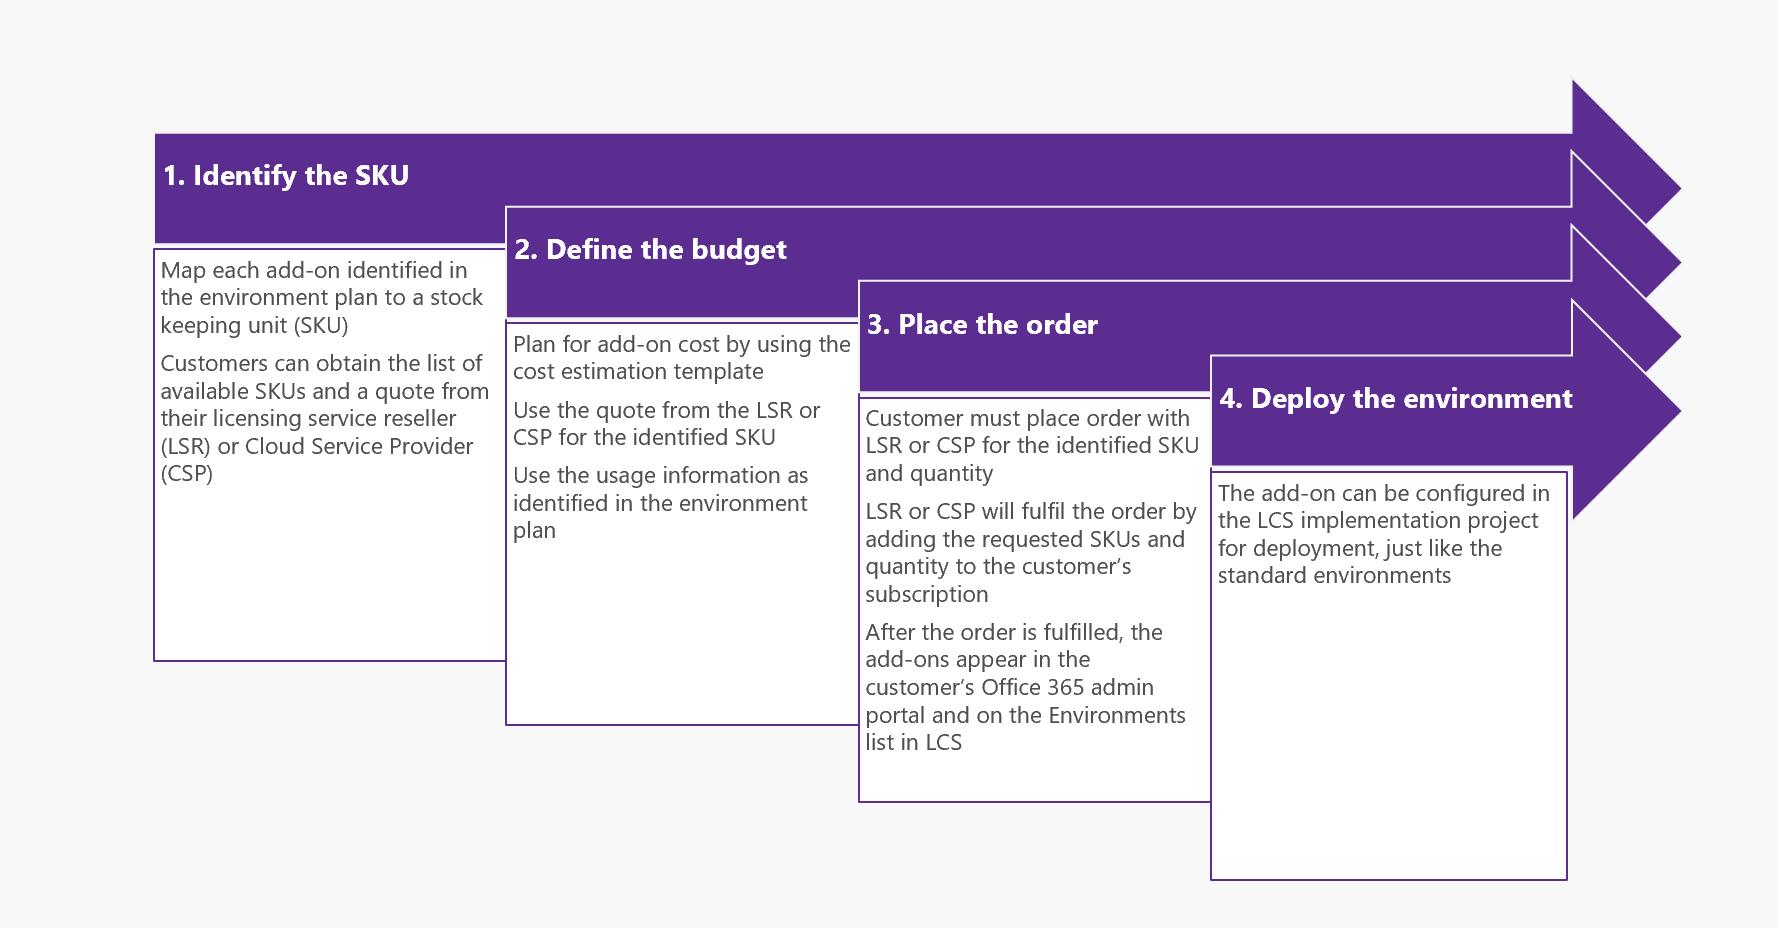 Environment planning - Finance & Operations | Dynamics 365 ...